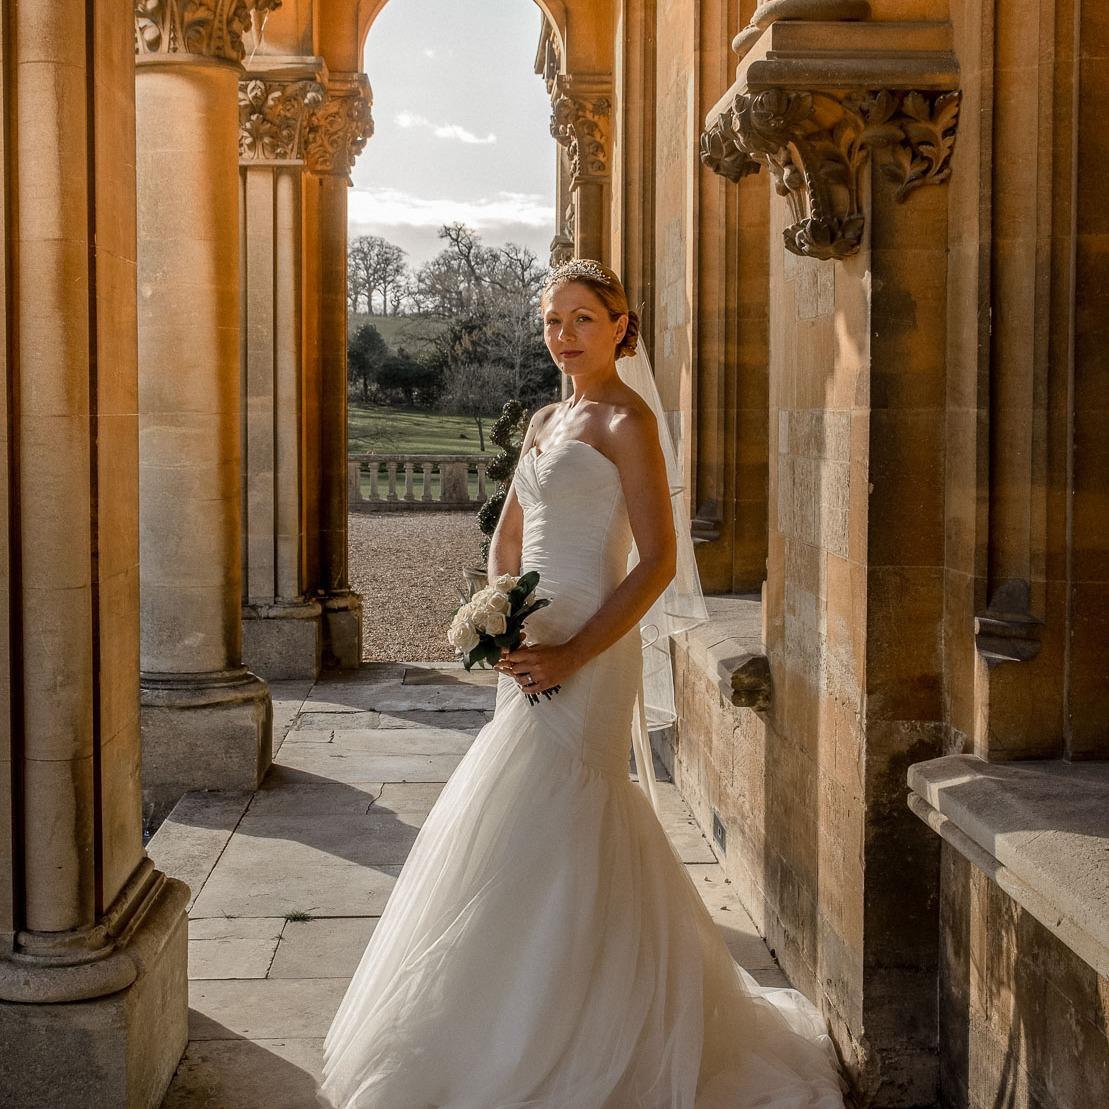 Warwickshire Wedding Photography Bride Oxfordshire Cotswold Gloucestershire Worcestershire Wedding Photographer Chris Fossey